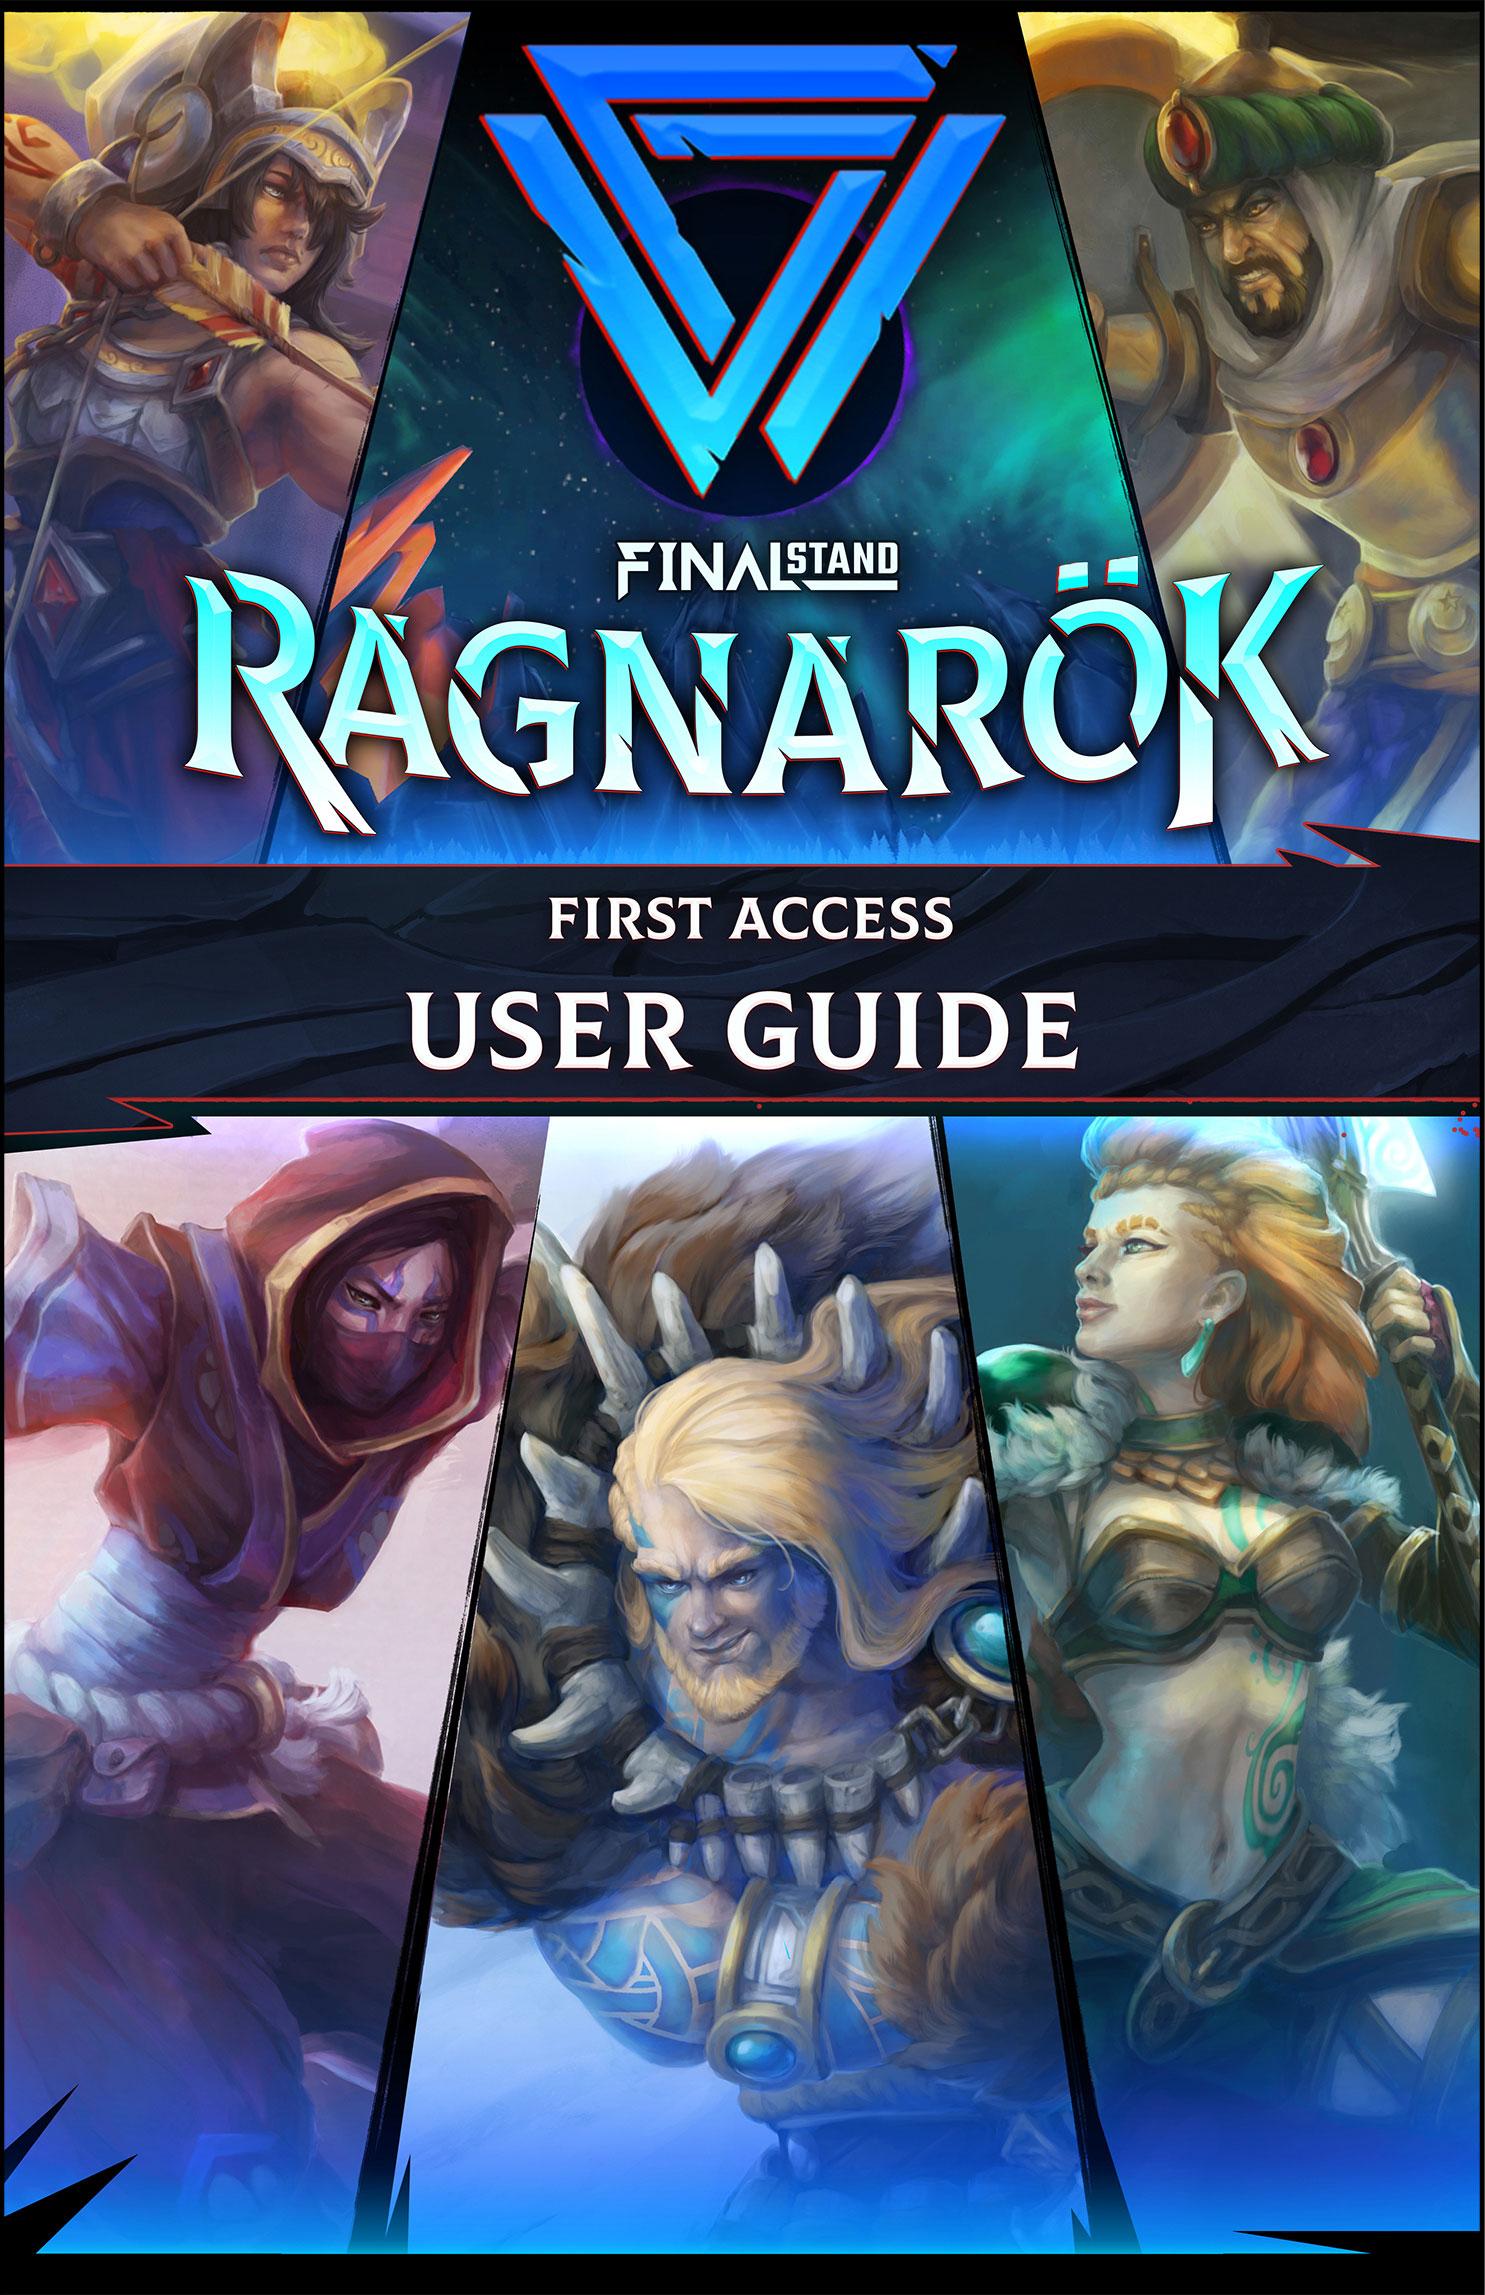 FSR-Guide_11x17_master_17-Final-for-FA-1